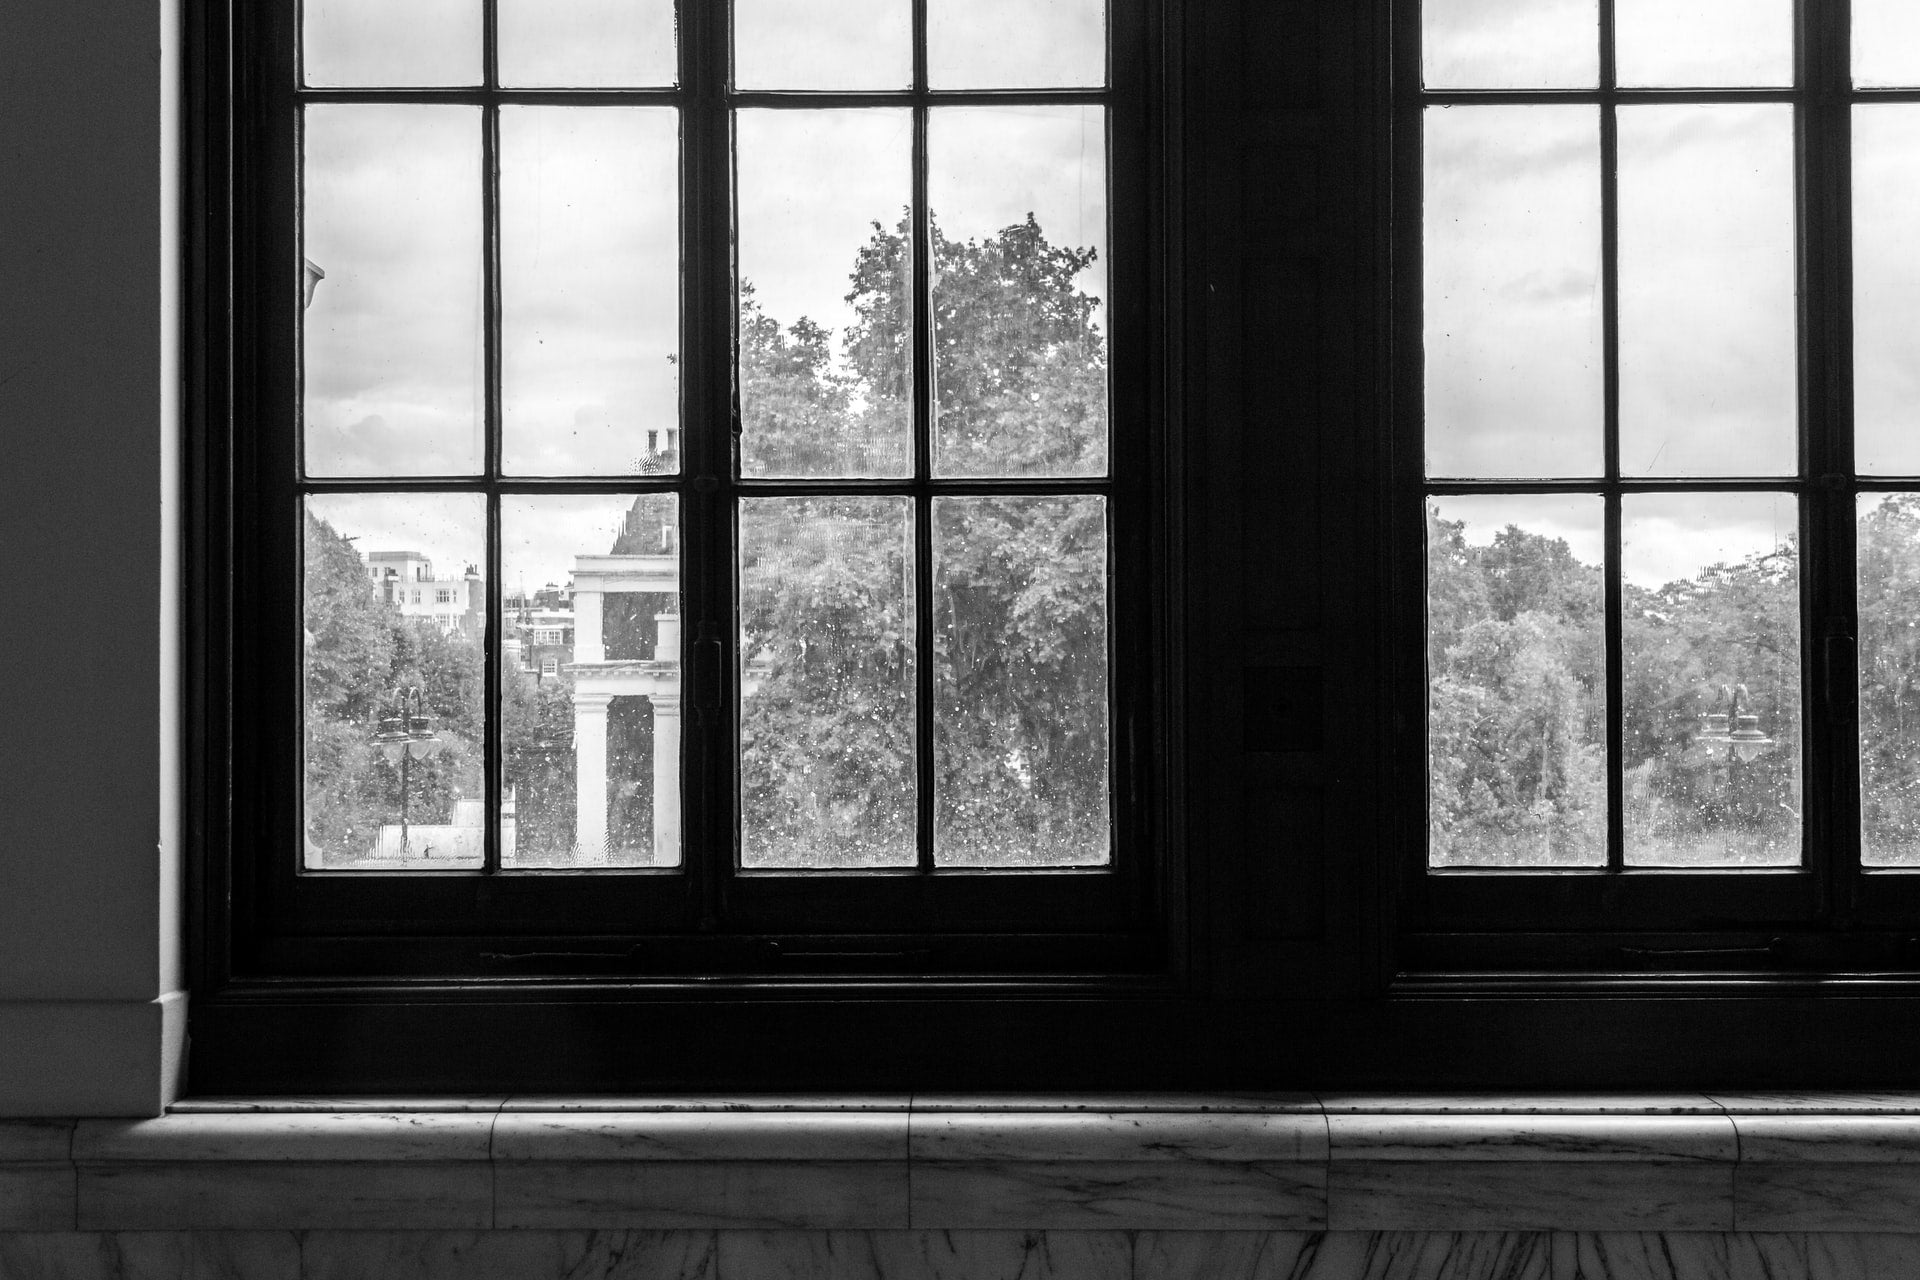 A set of museum windows